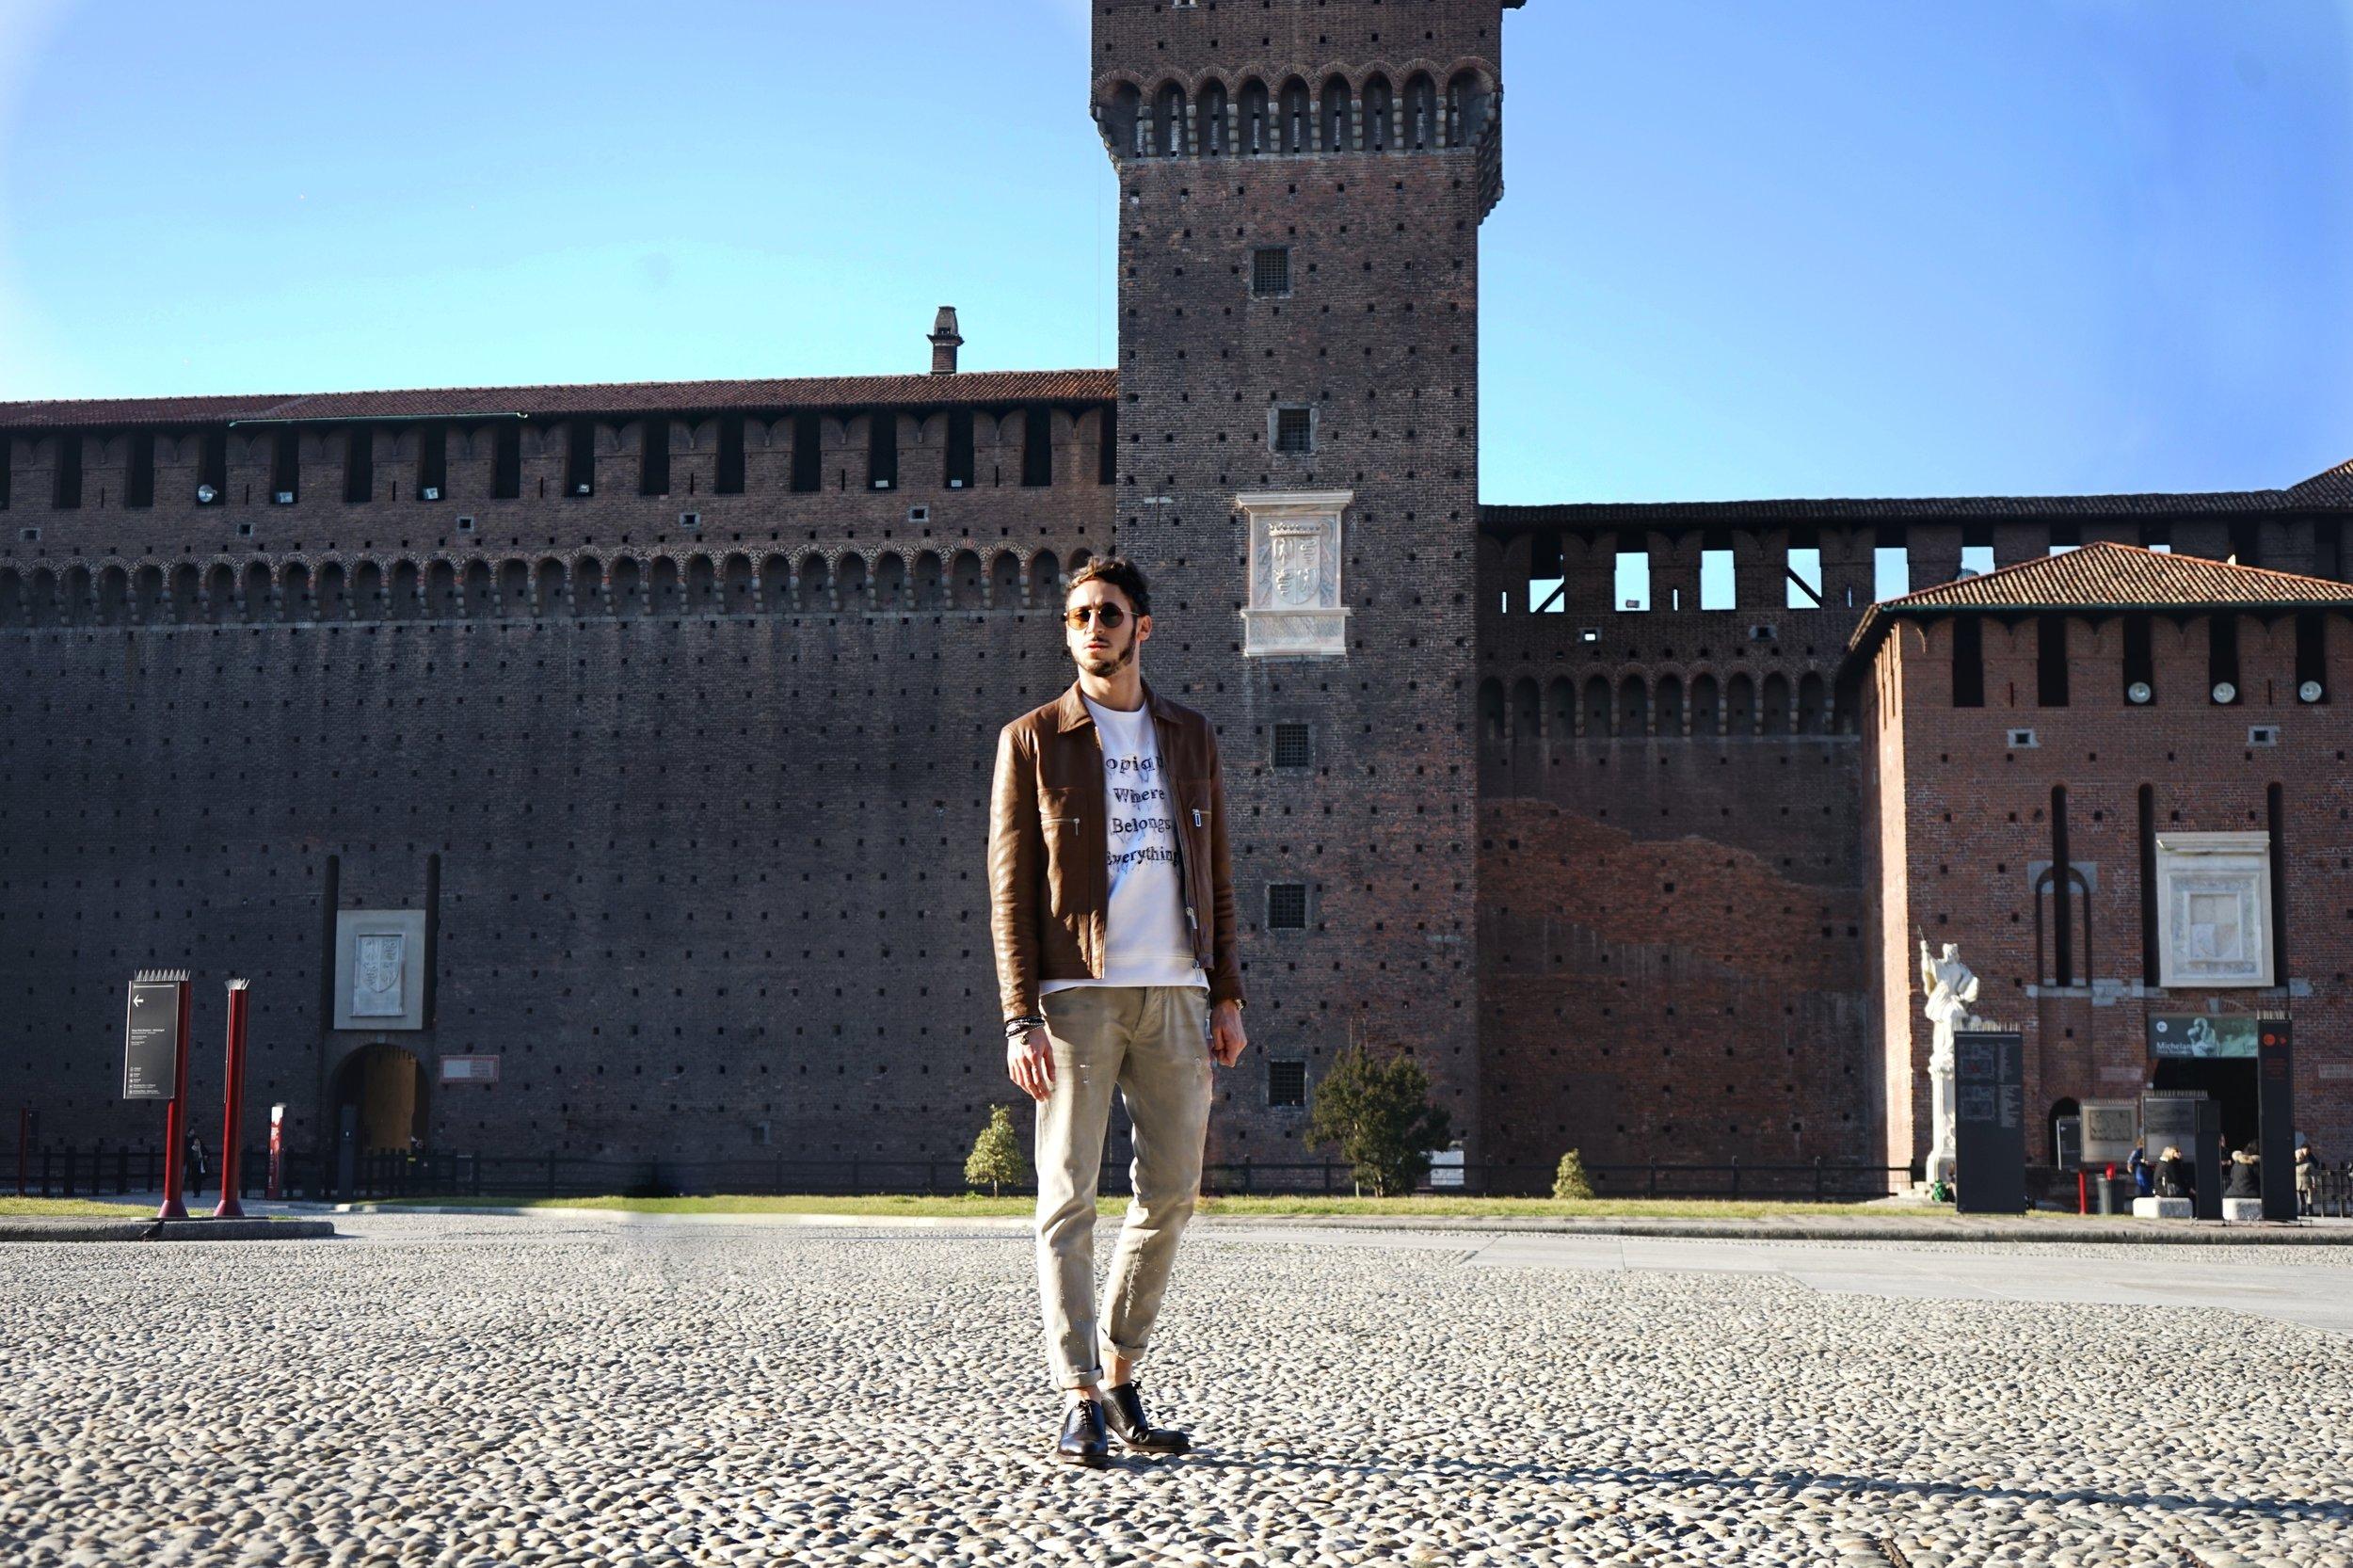 A day together with Nicola Ruscino in Castello Milano. mensfashion Blogger influencer David lundin topmodel-2.jpg